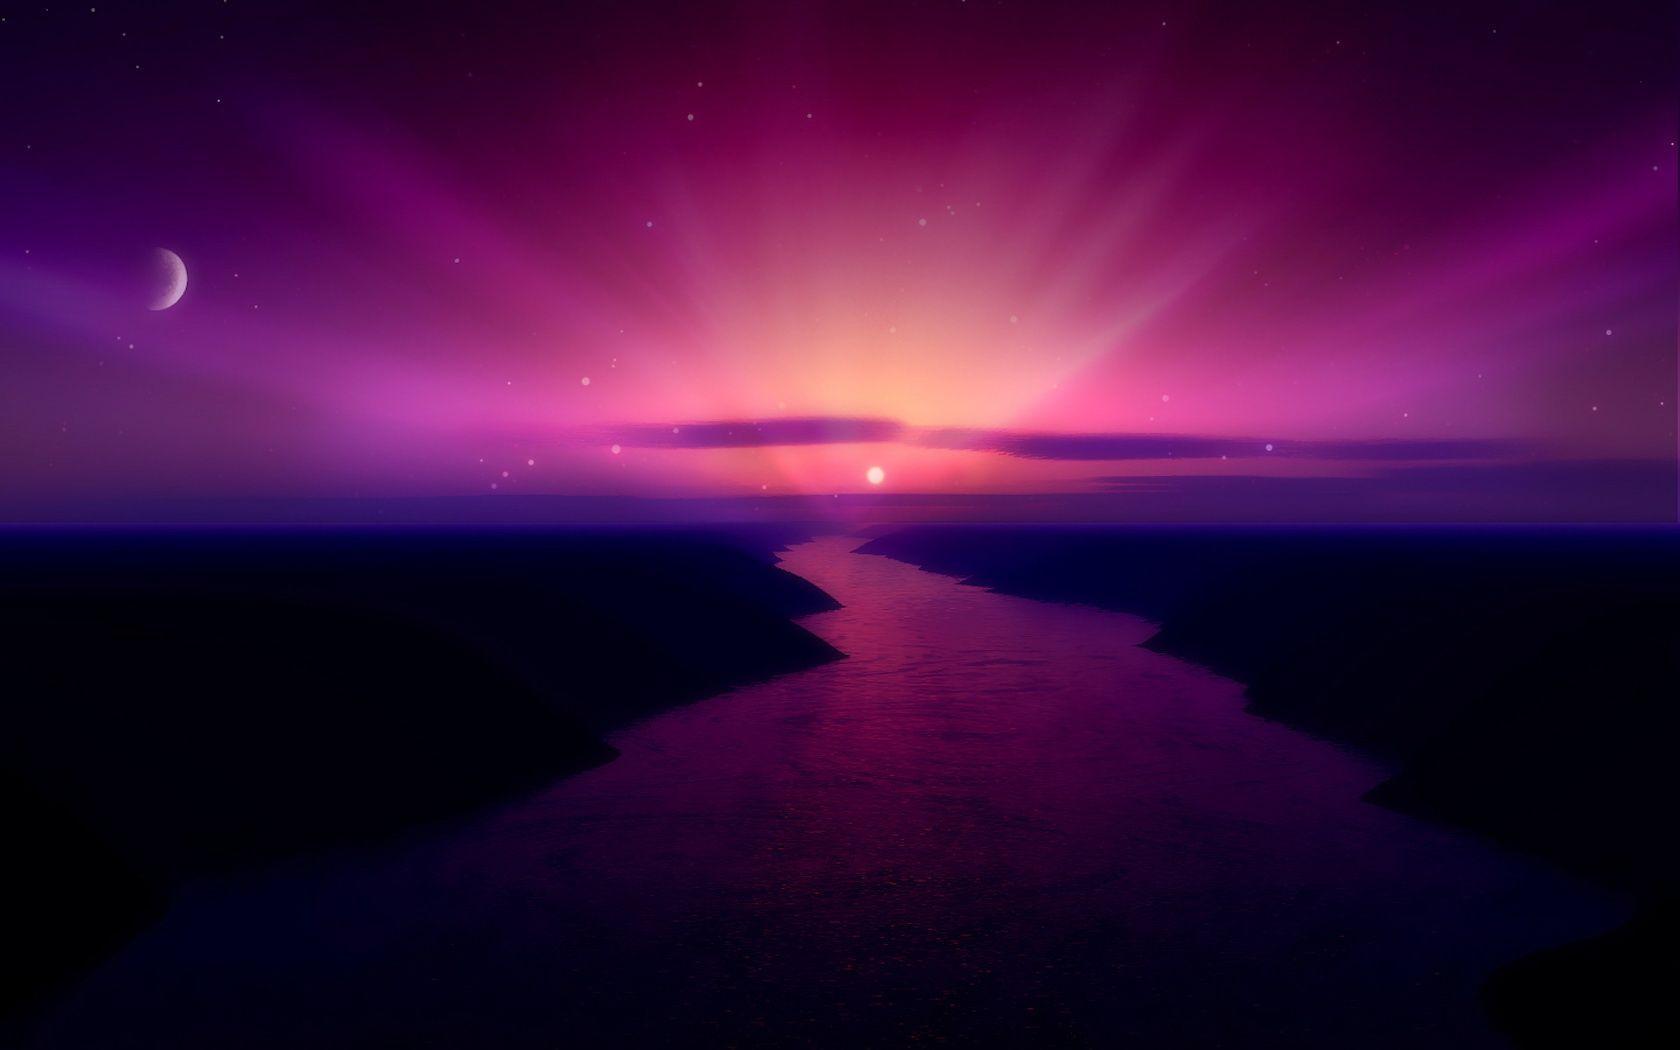 Morning Purple Sunrise Wallpapers | HD Wallpapers